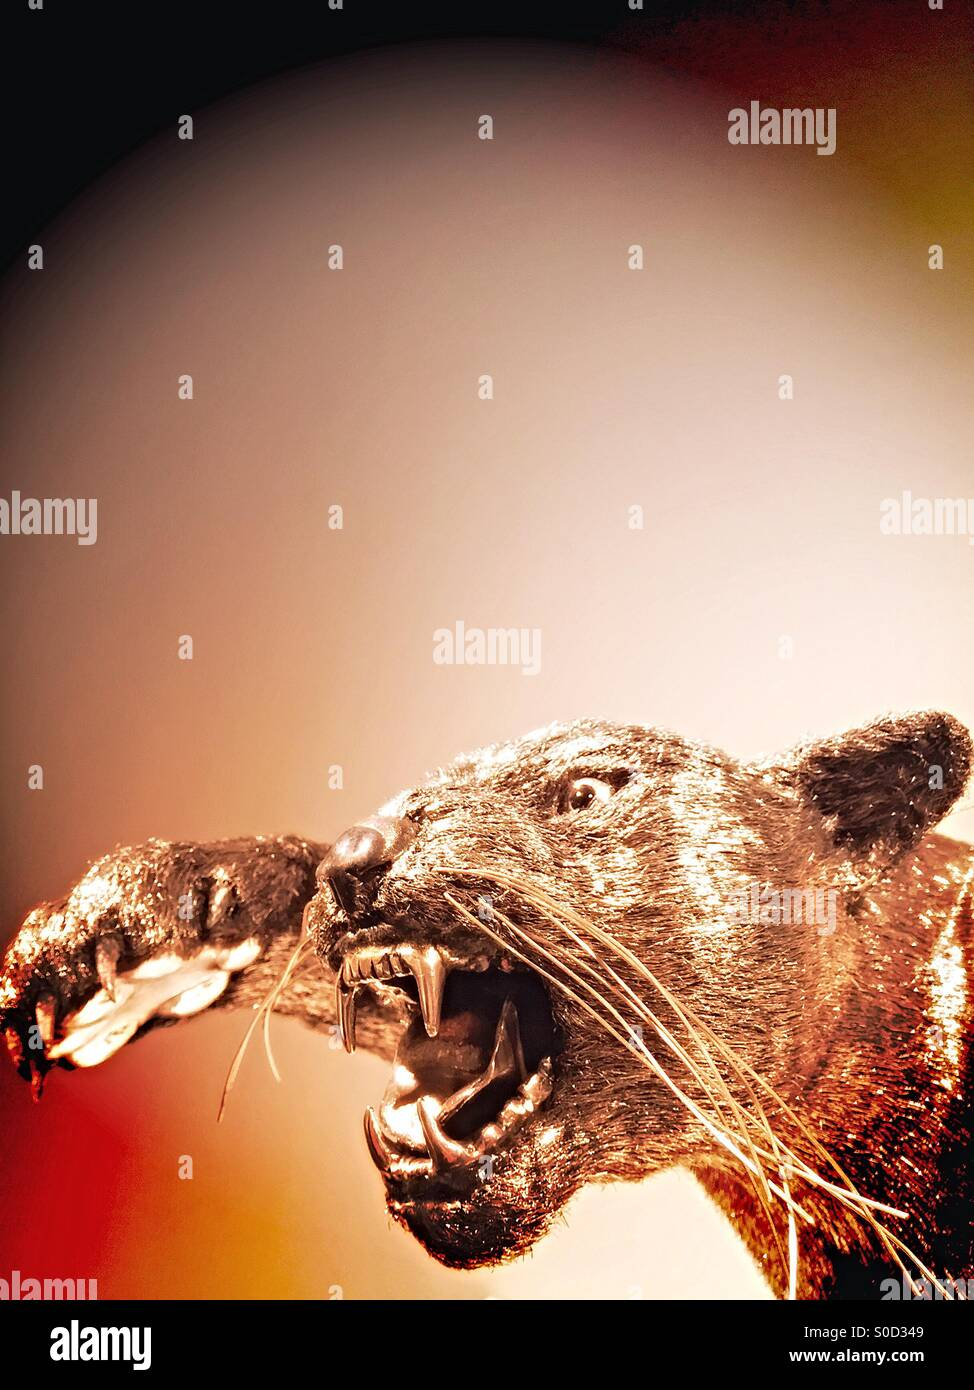 Puma Sculpture - Stock Image